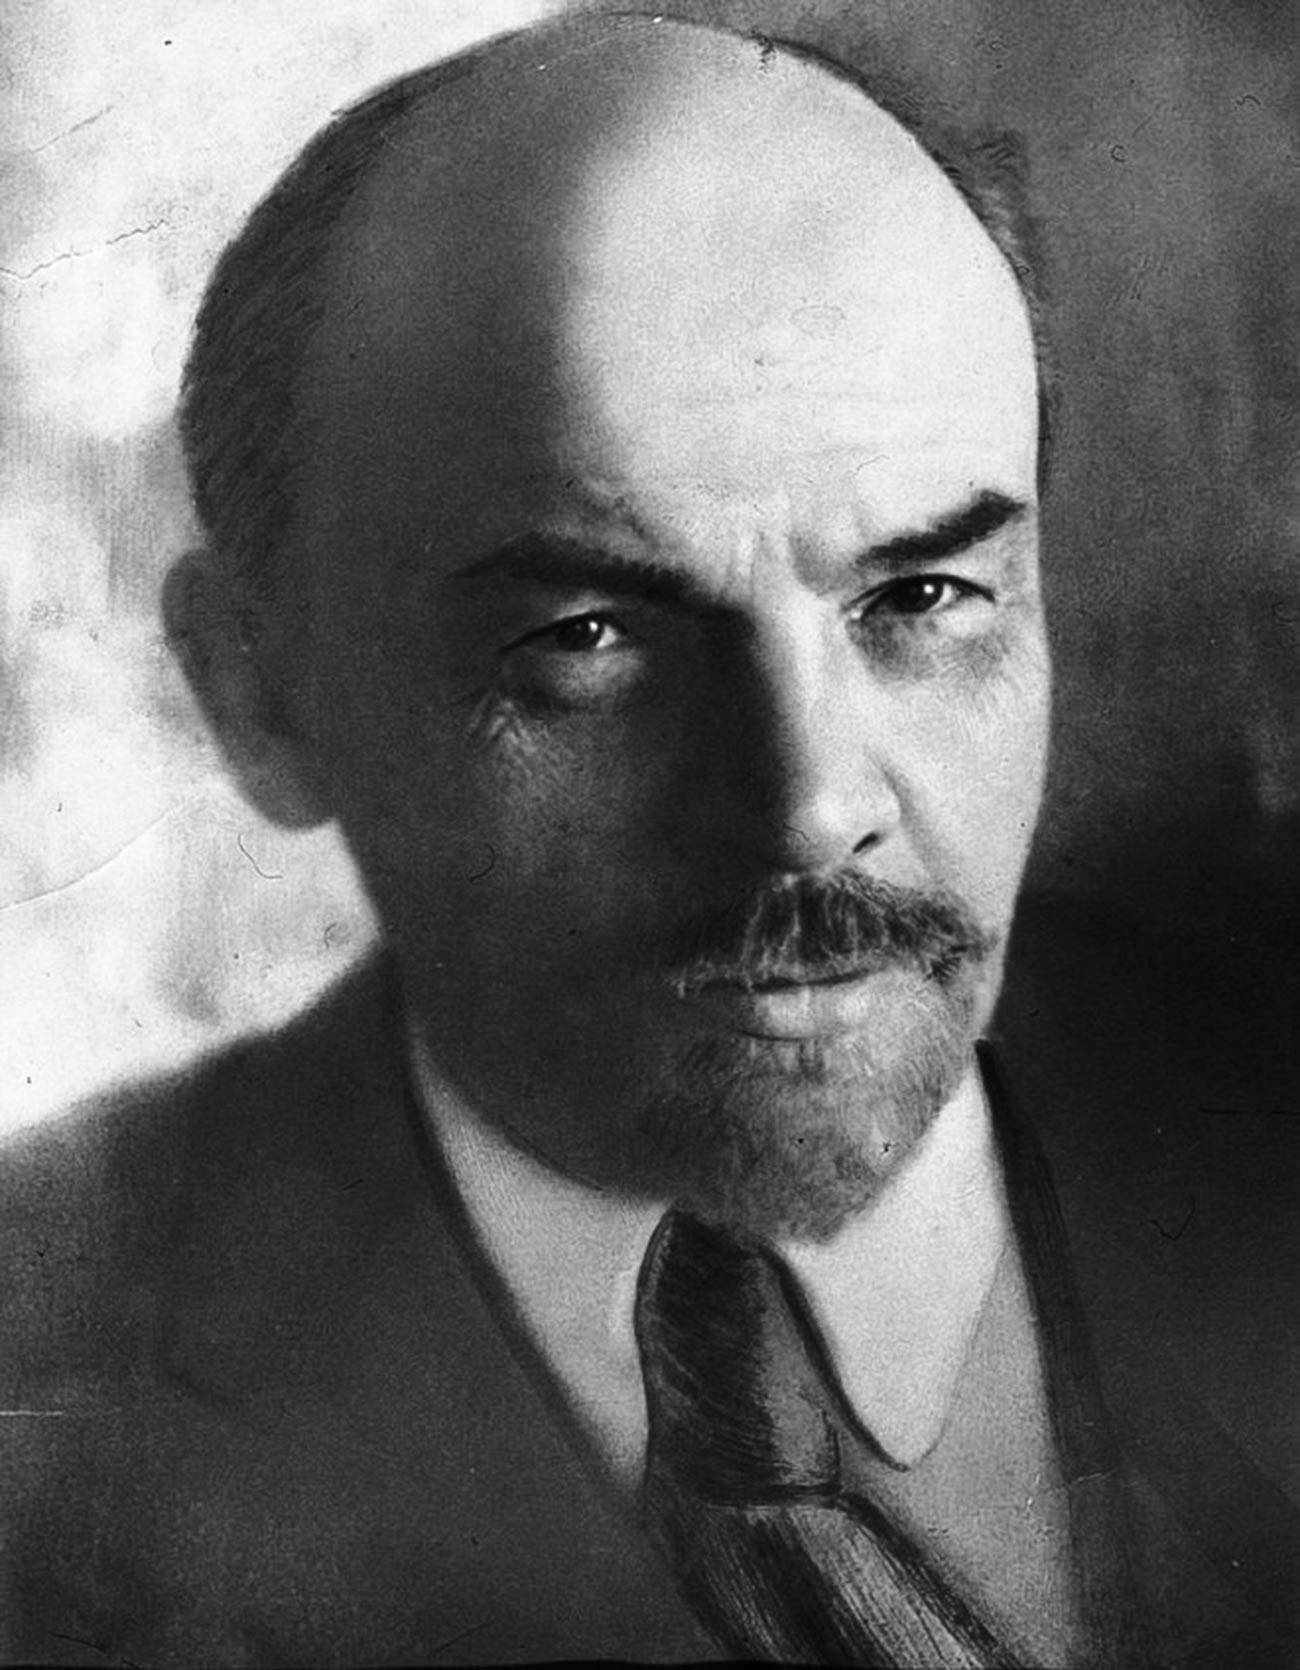 The first Soviet leader, Vladimir Lenin, 1918